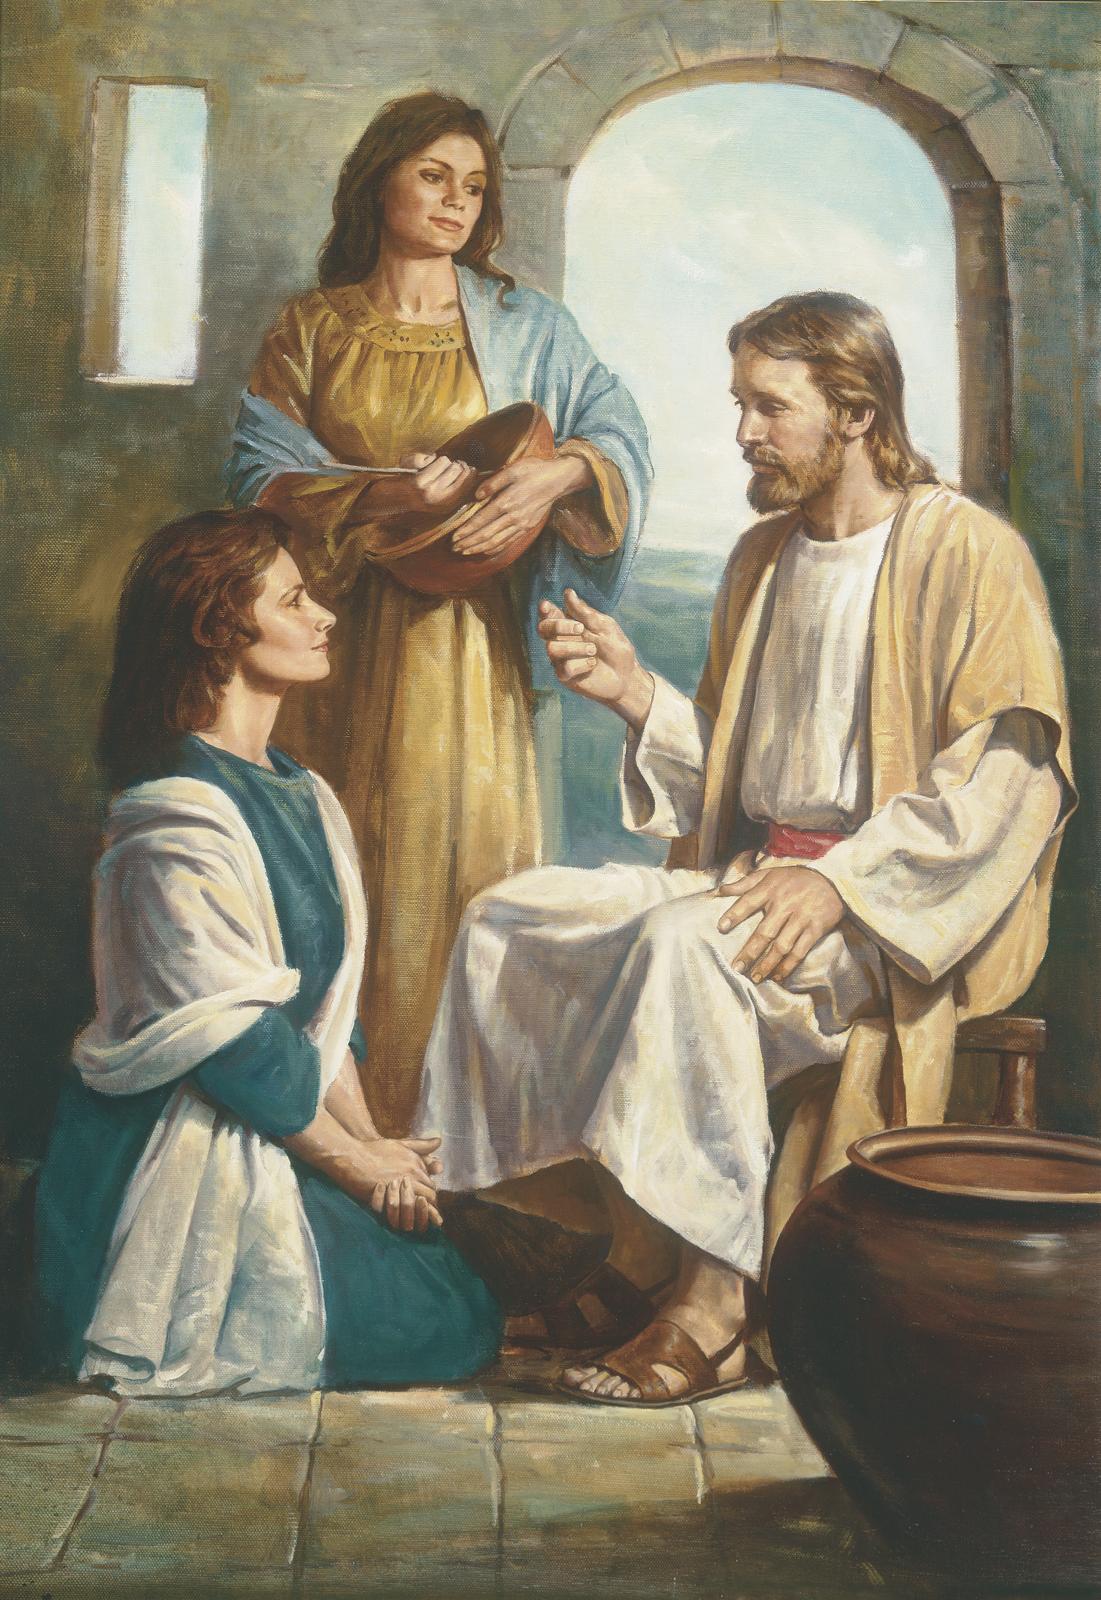 Lesson 7: Jesus Christ—The Greatest Prophet